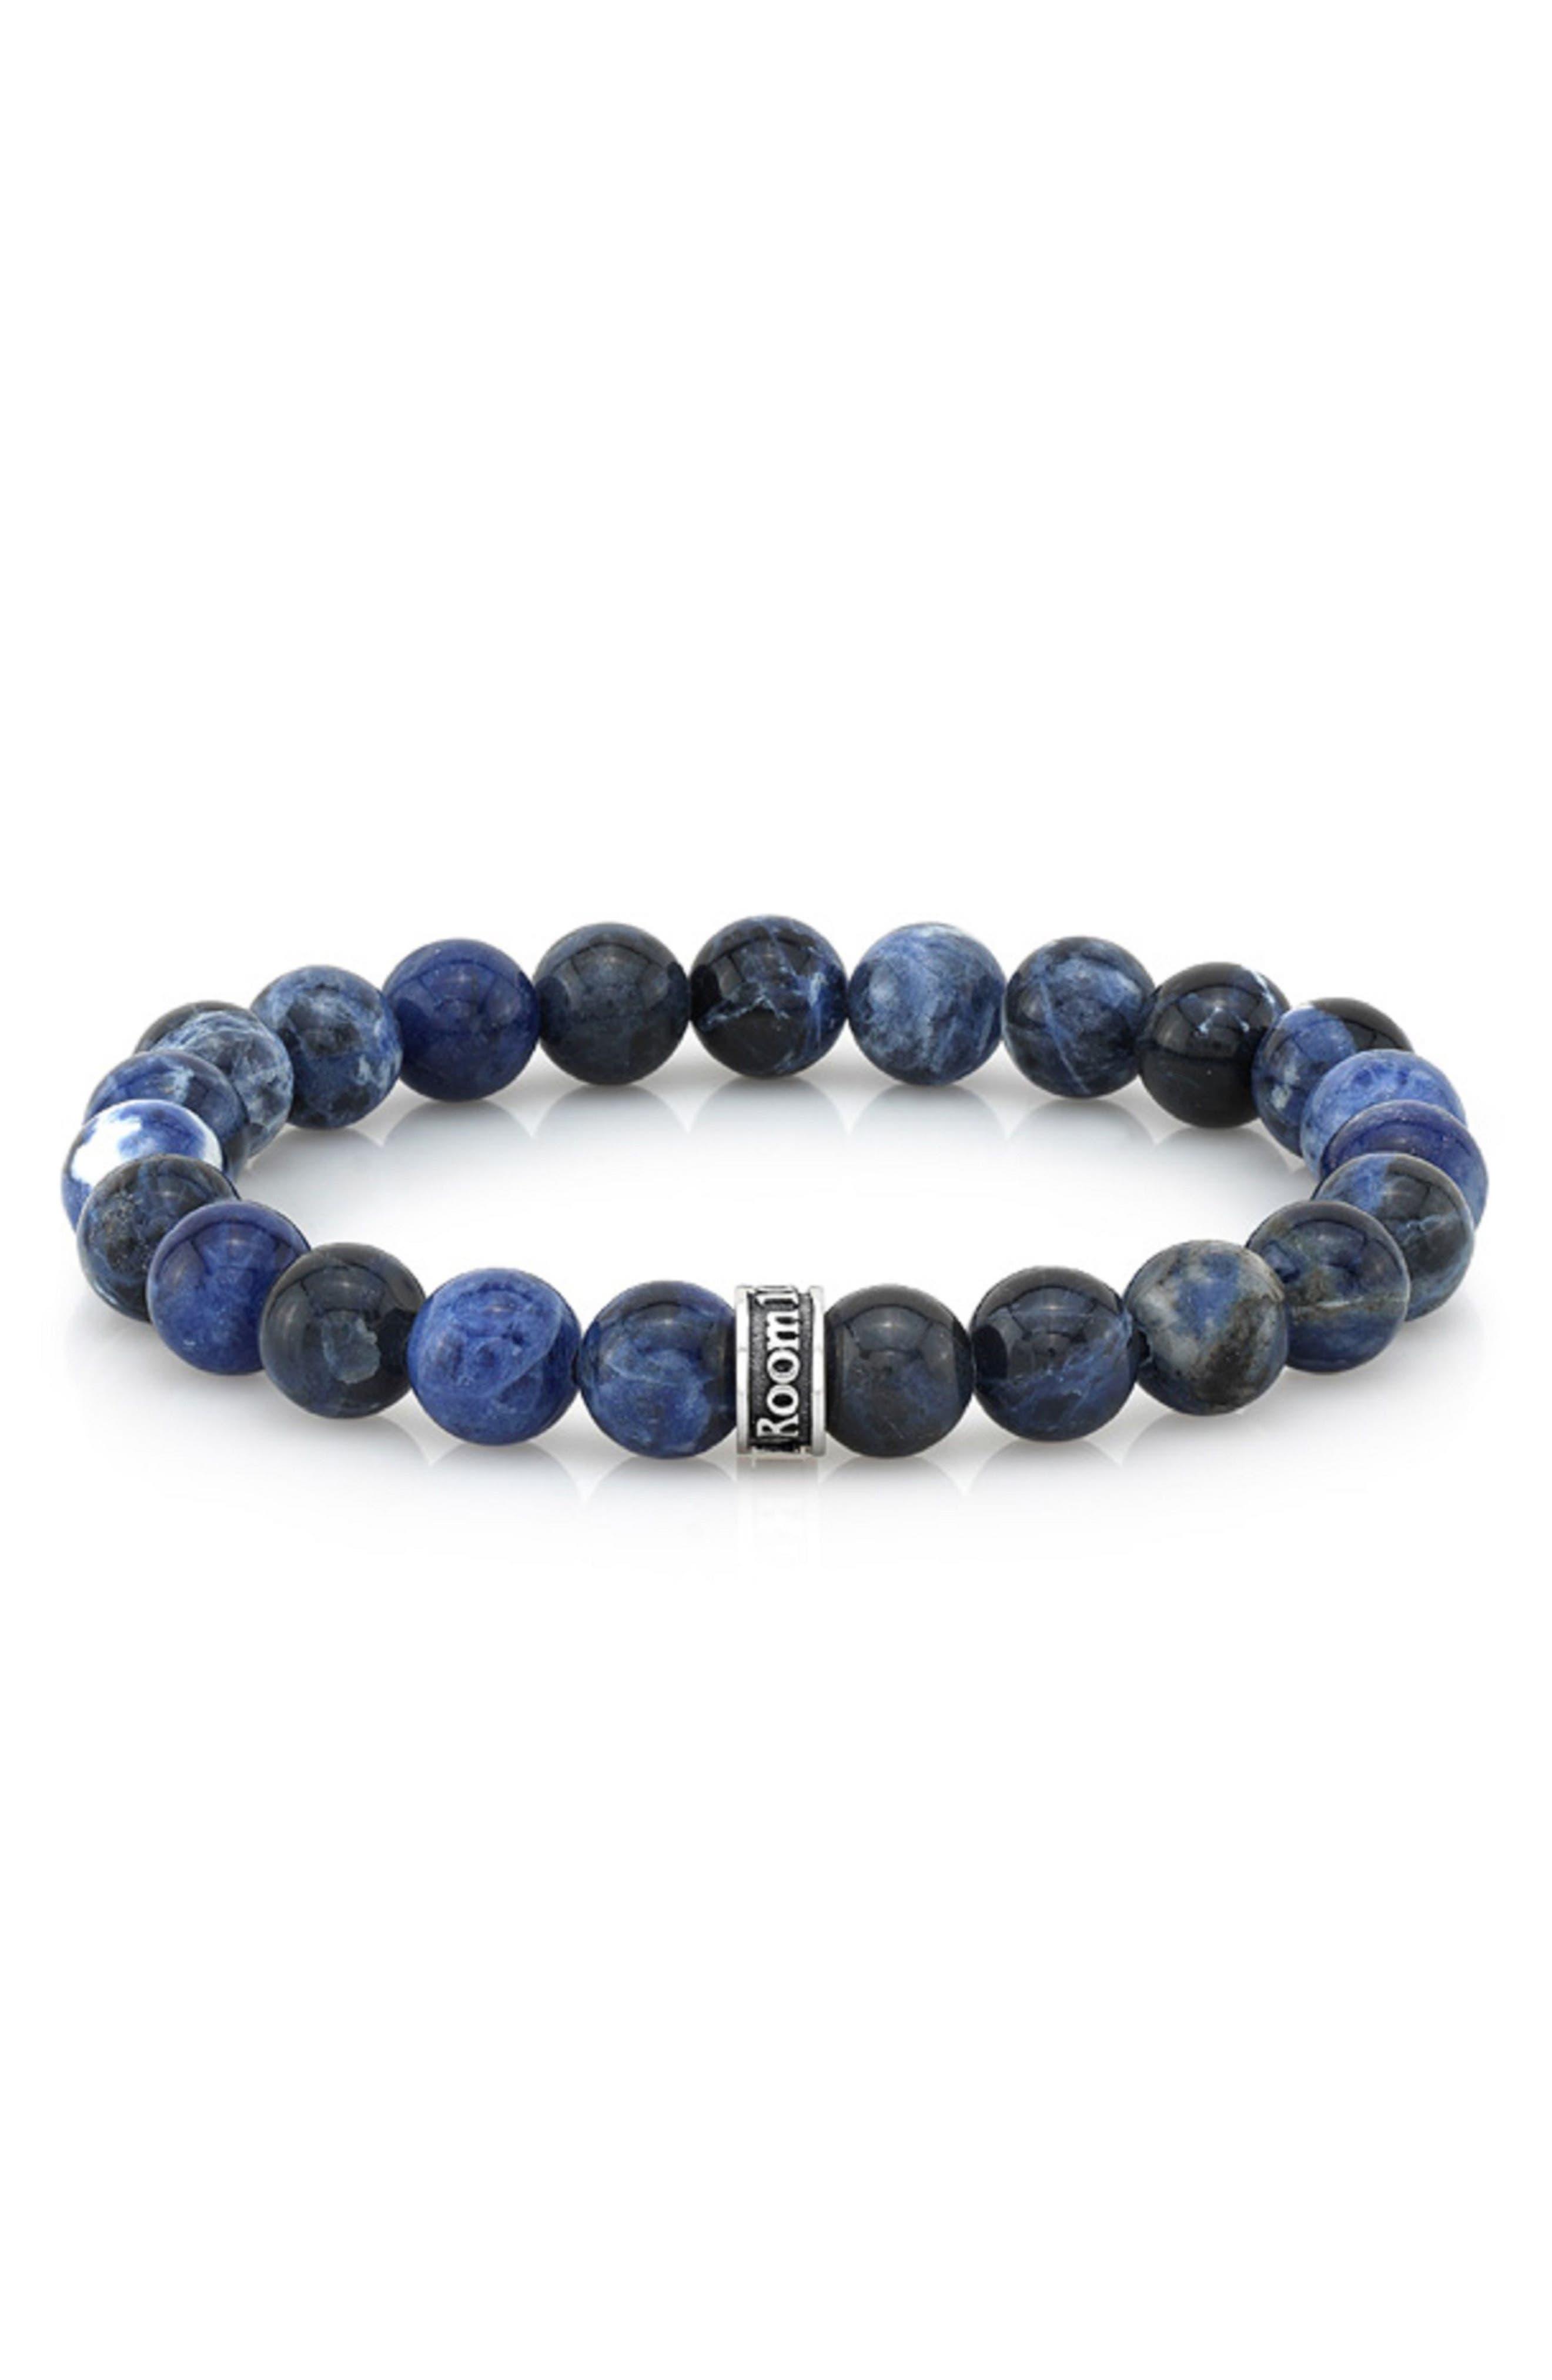 Room 101 Sodalite Bead Bracelet